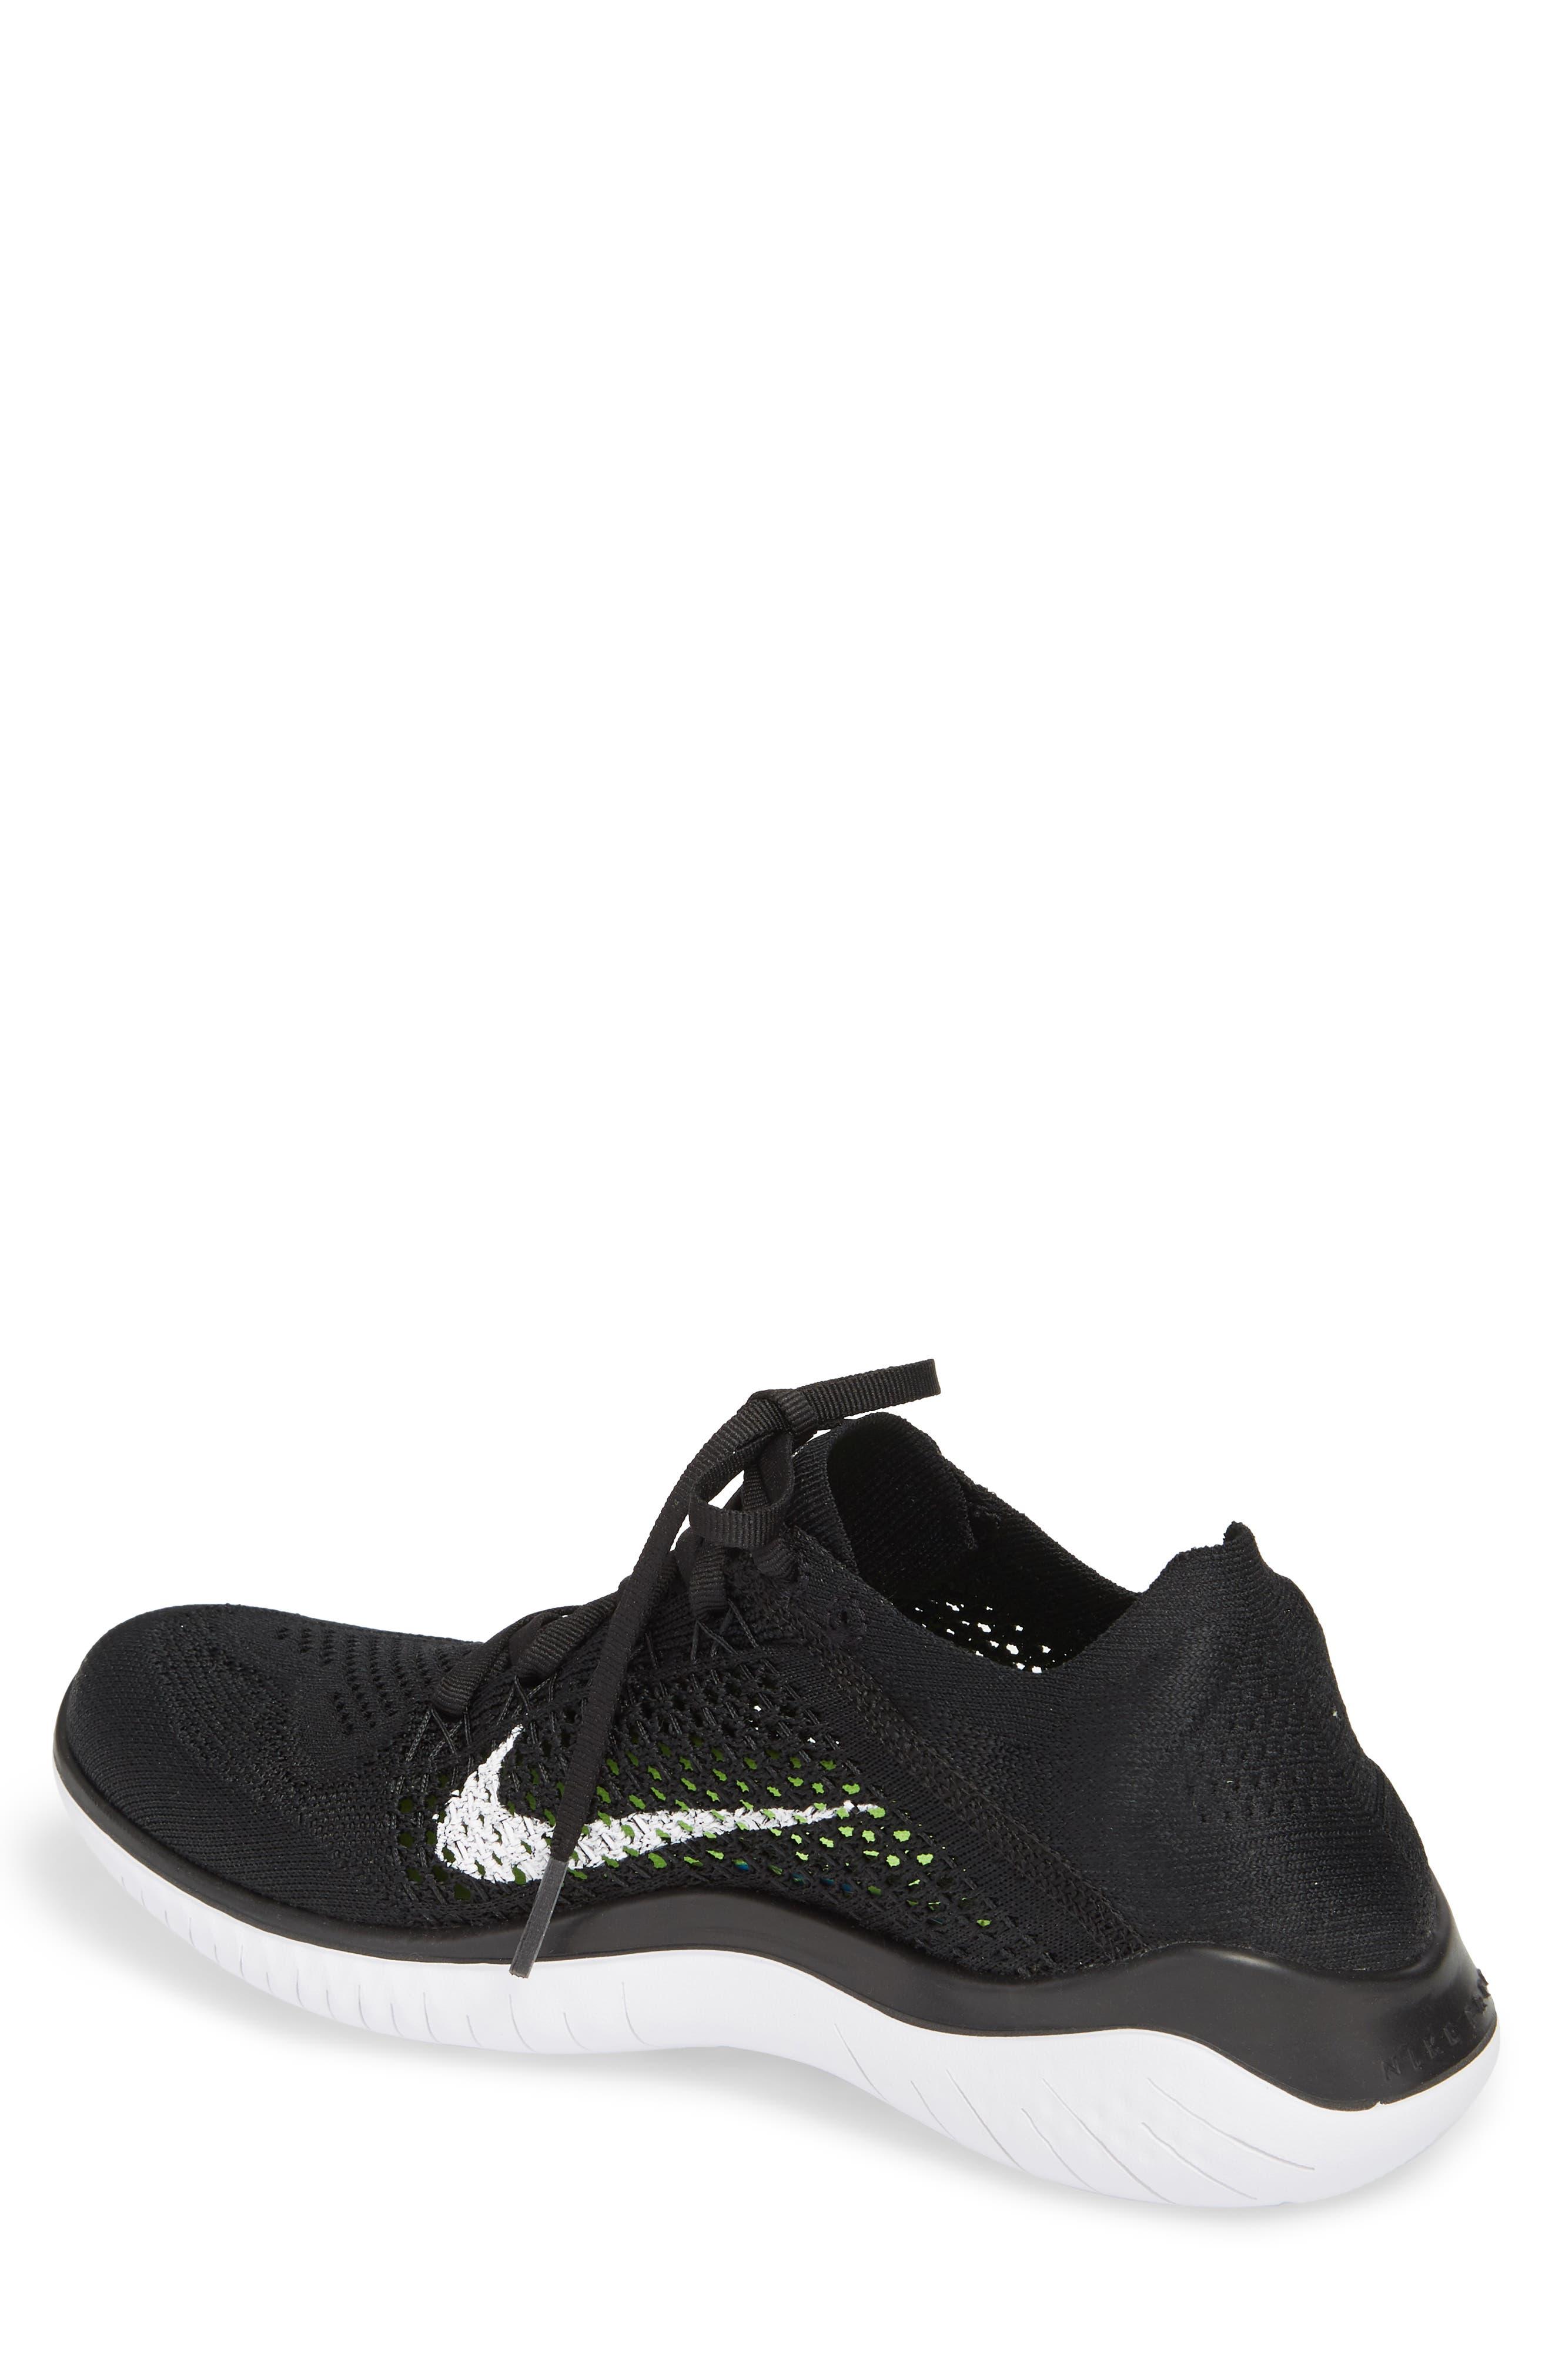 quality design 3979b cc06b Nike Free Run  Nordstrom